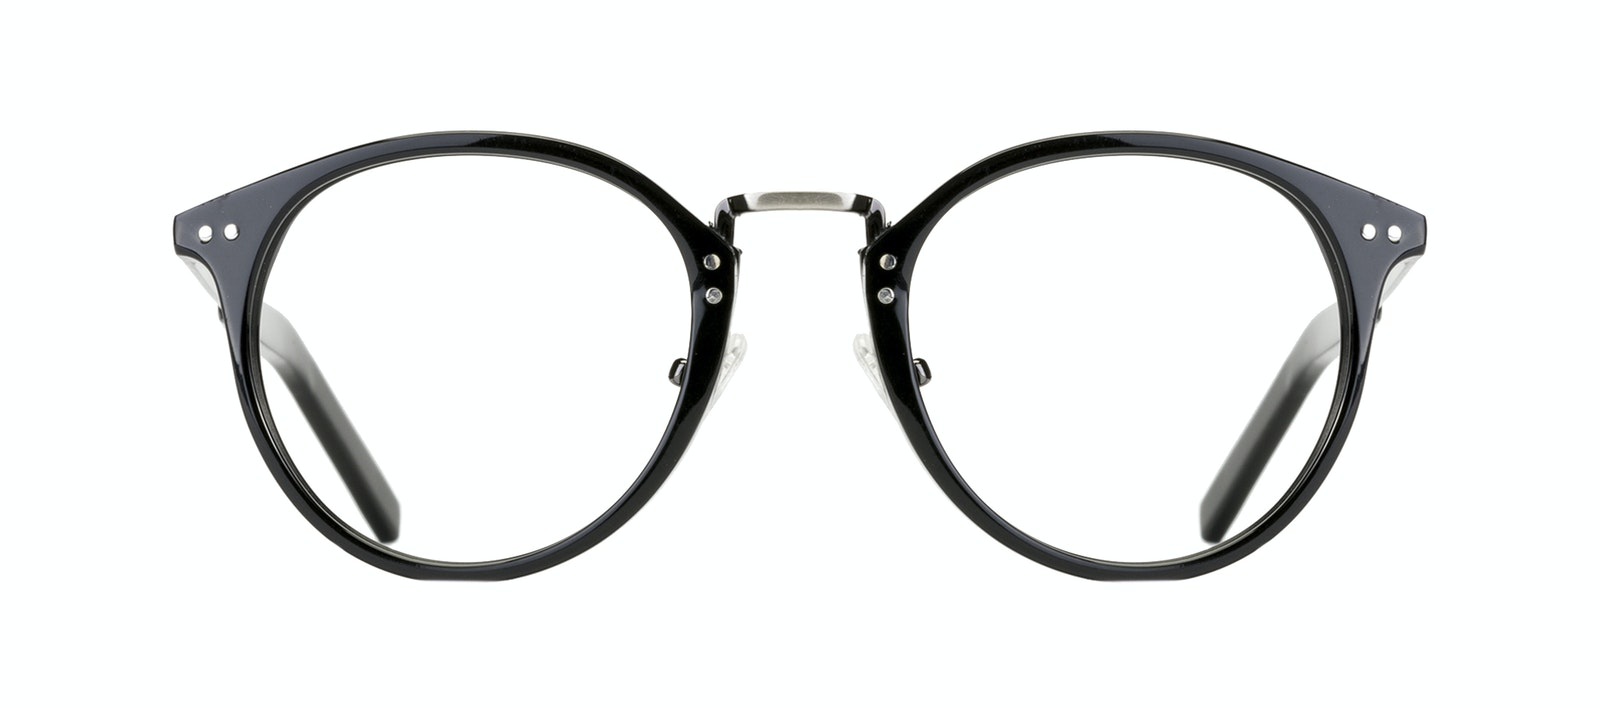 ae5768882 Affordable Fashion Glasses Round Eyeglasses Men Truly Black Front